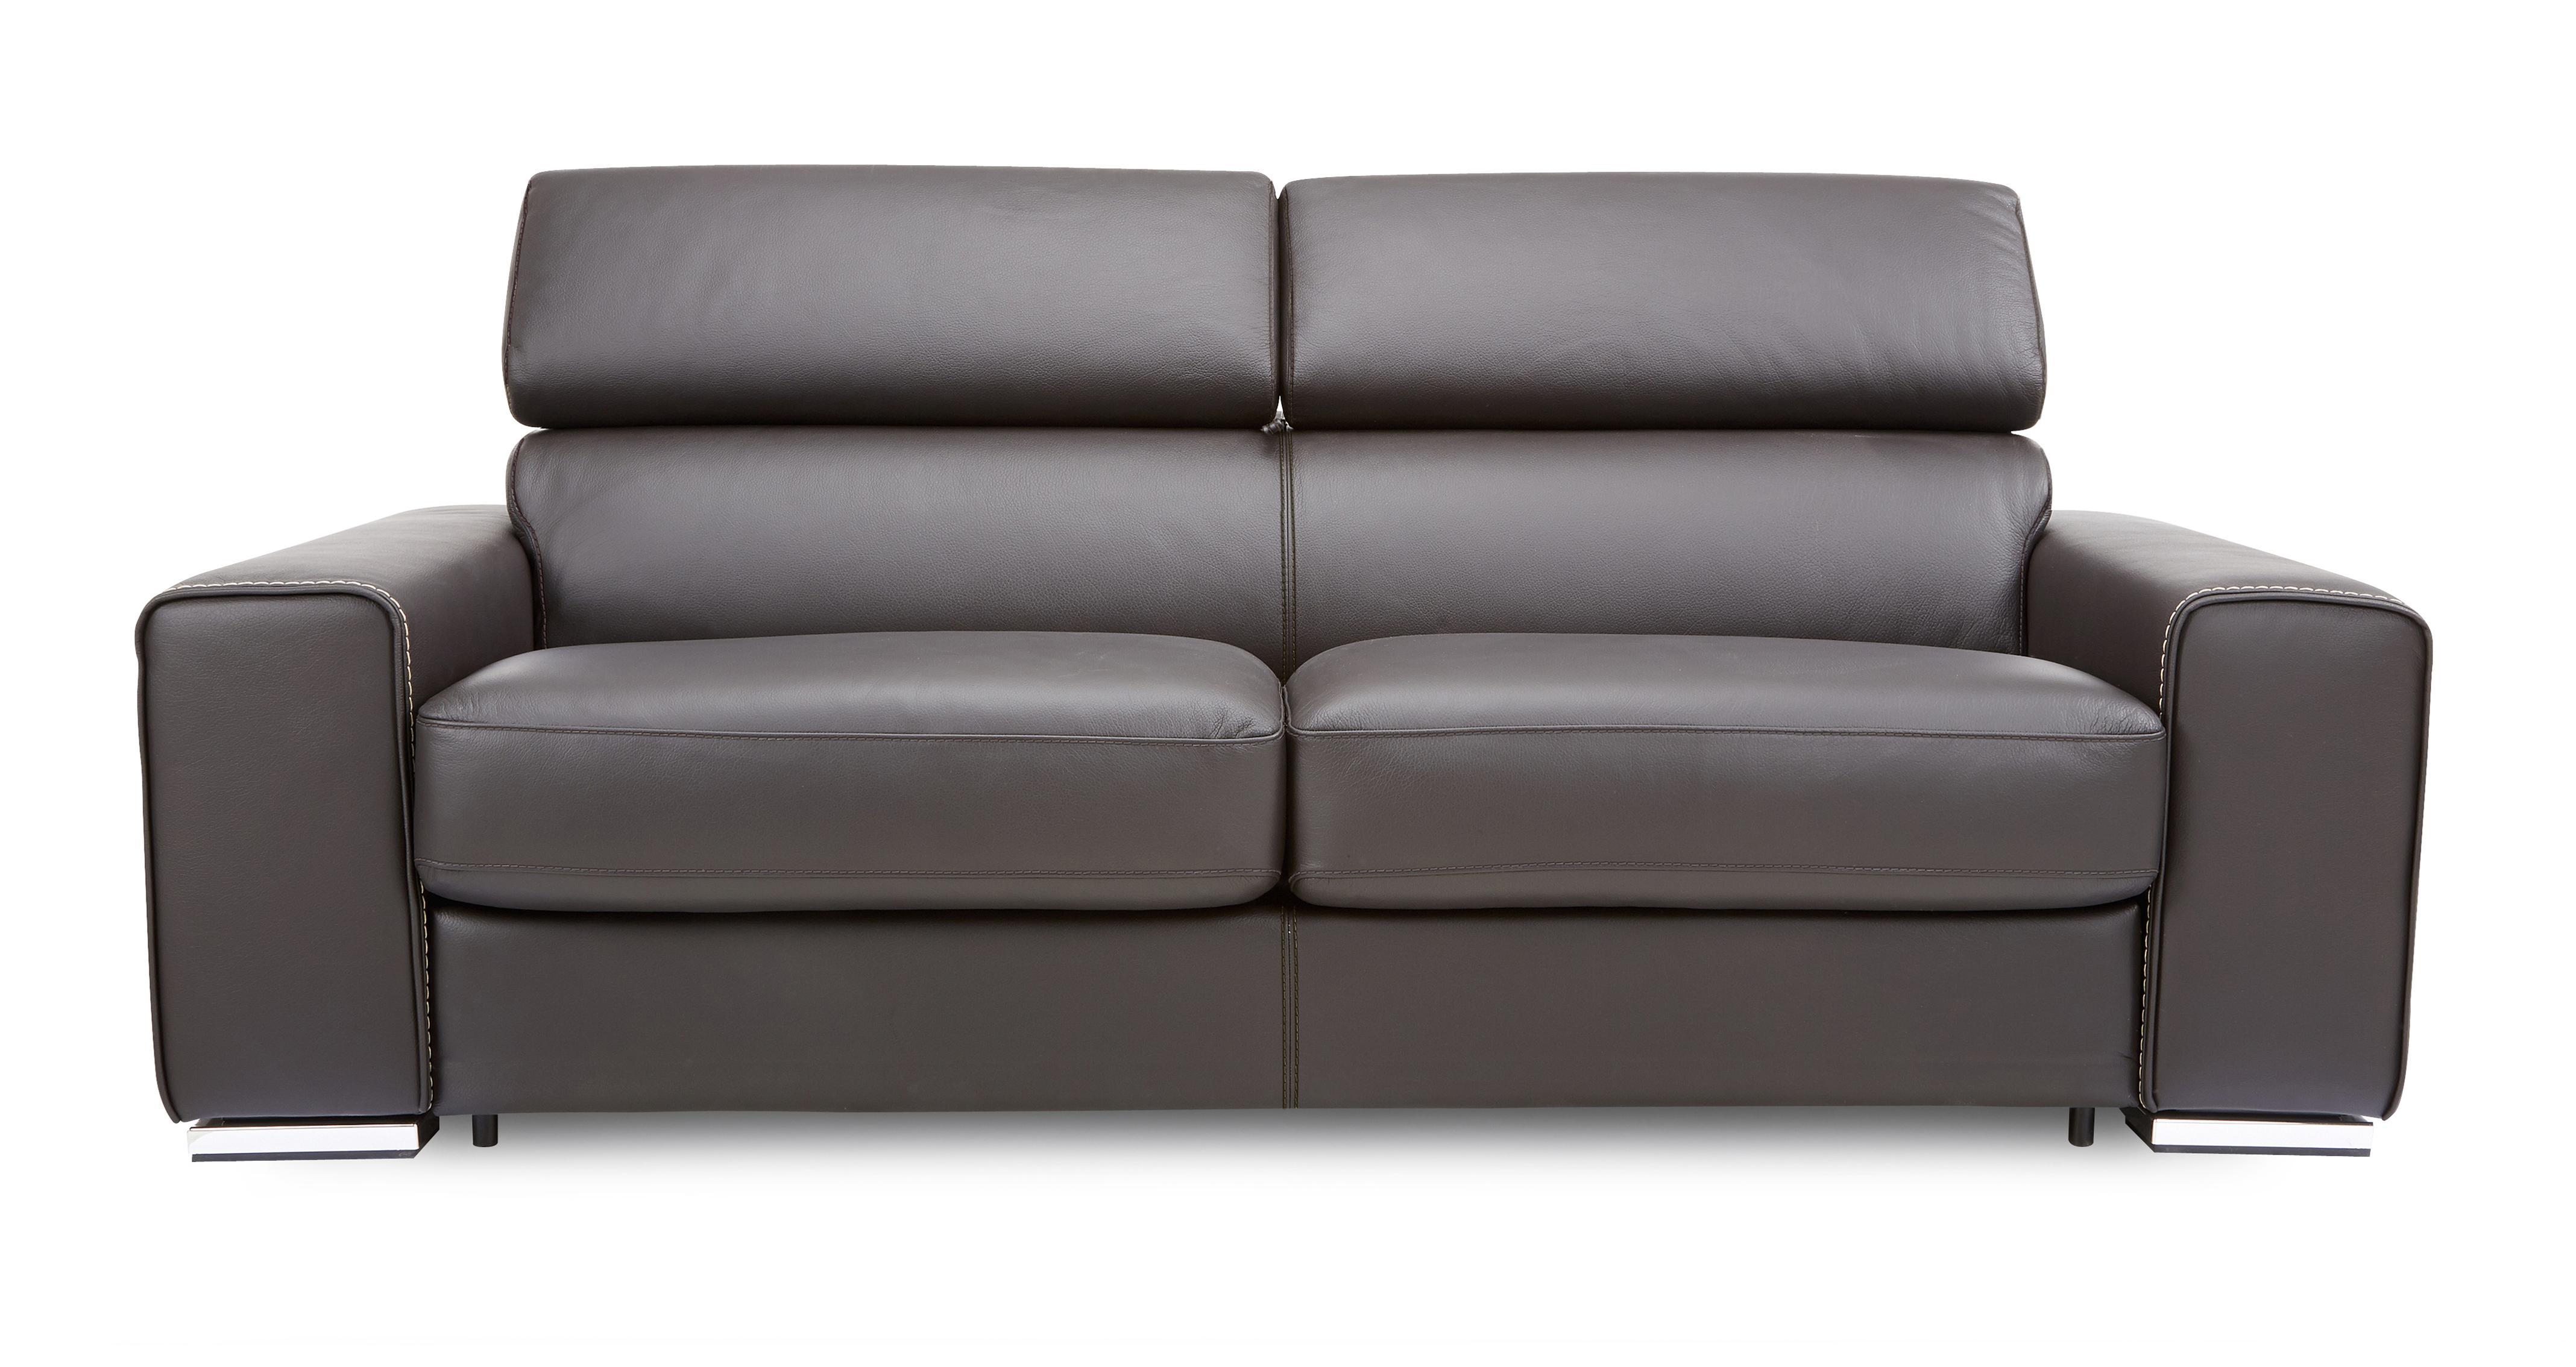 Kalamos 3 Seater Sofa Bed Sierra Contrast Dfs. Dfs Two Seater Sofa Bed   memsaheb net